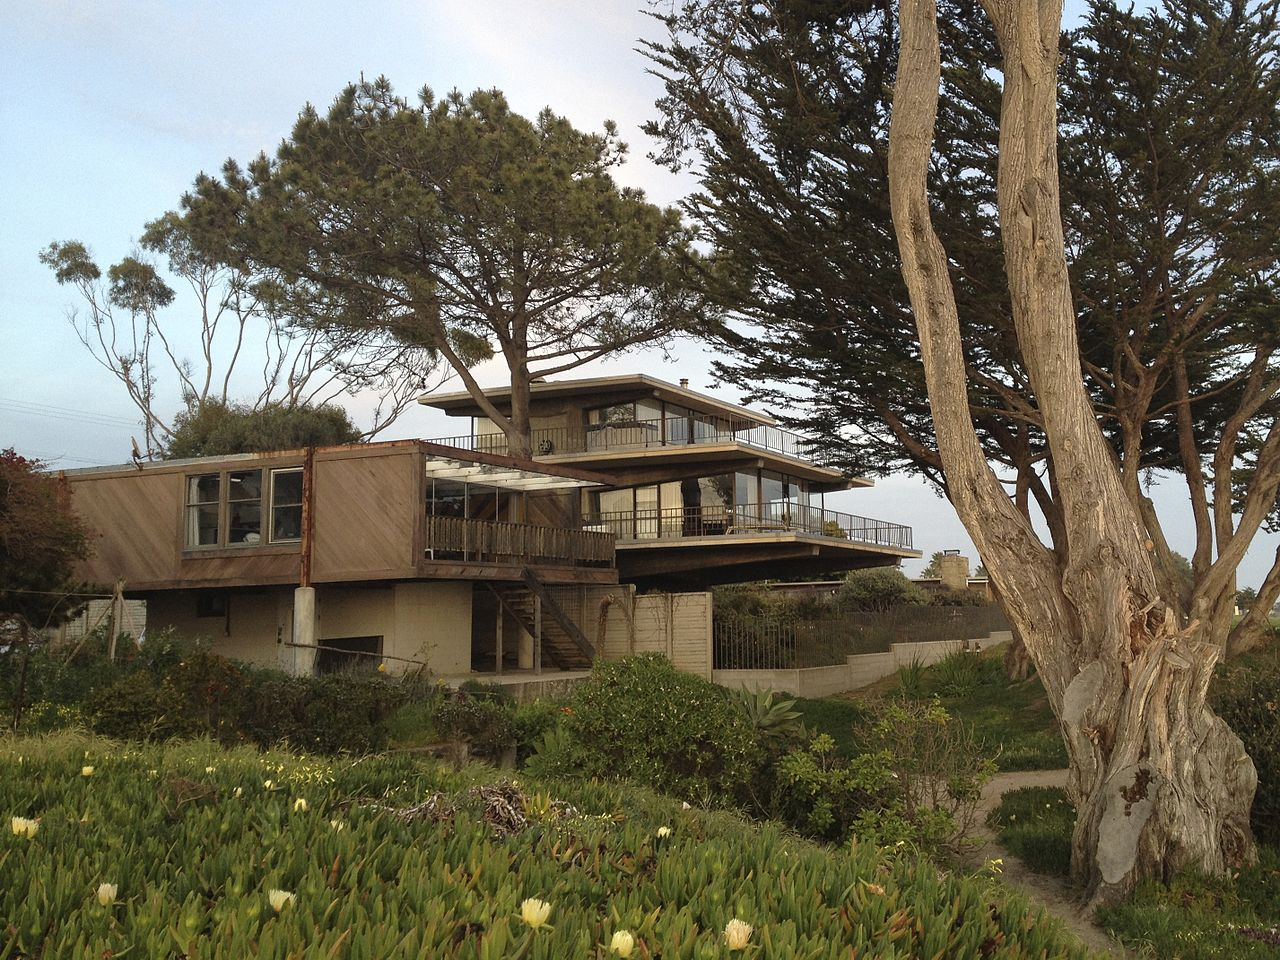 File:Isla Vista mid-century beach houses.jpg - Wikimedia Commons